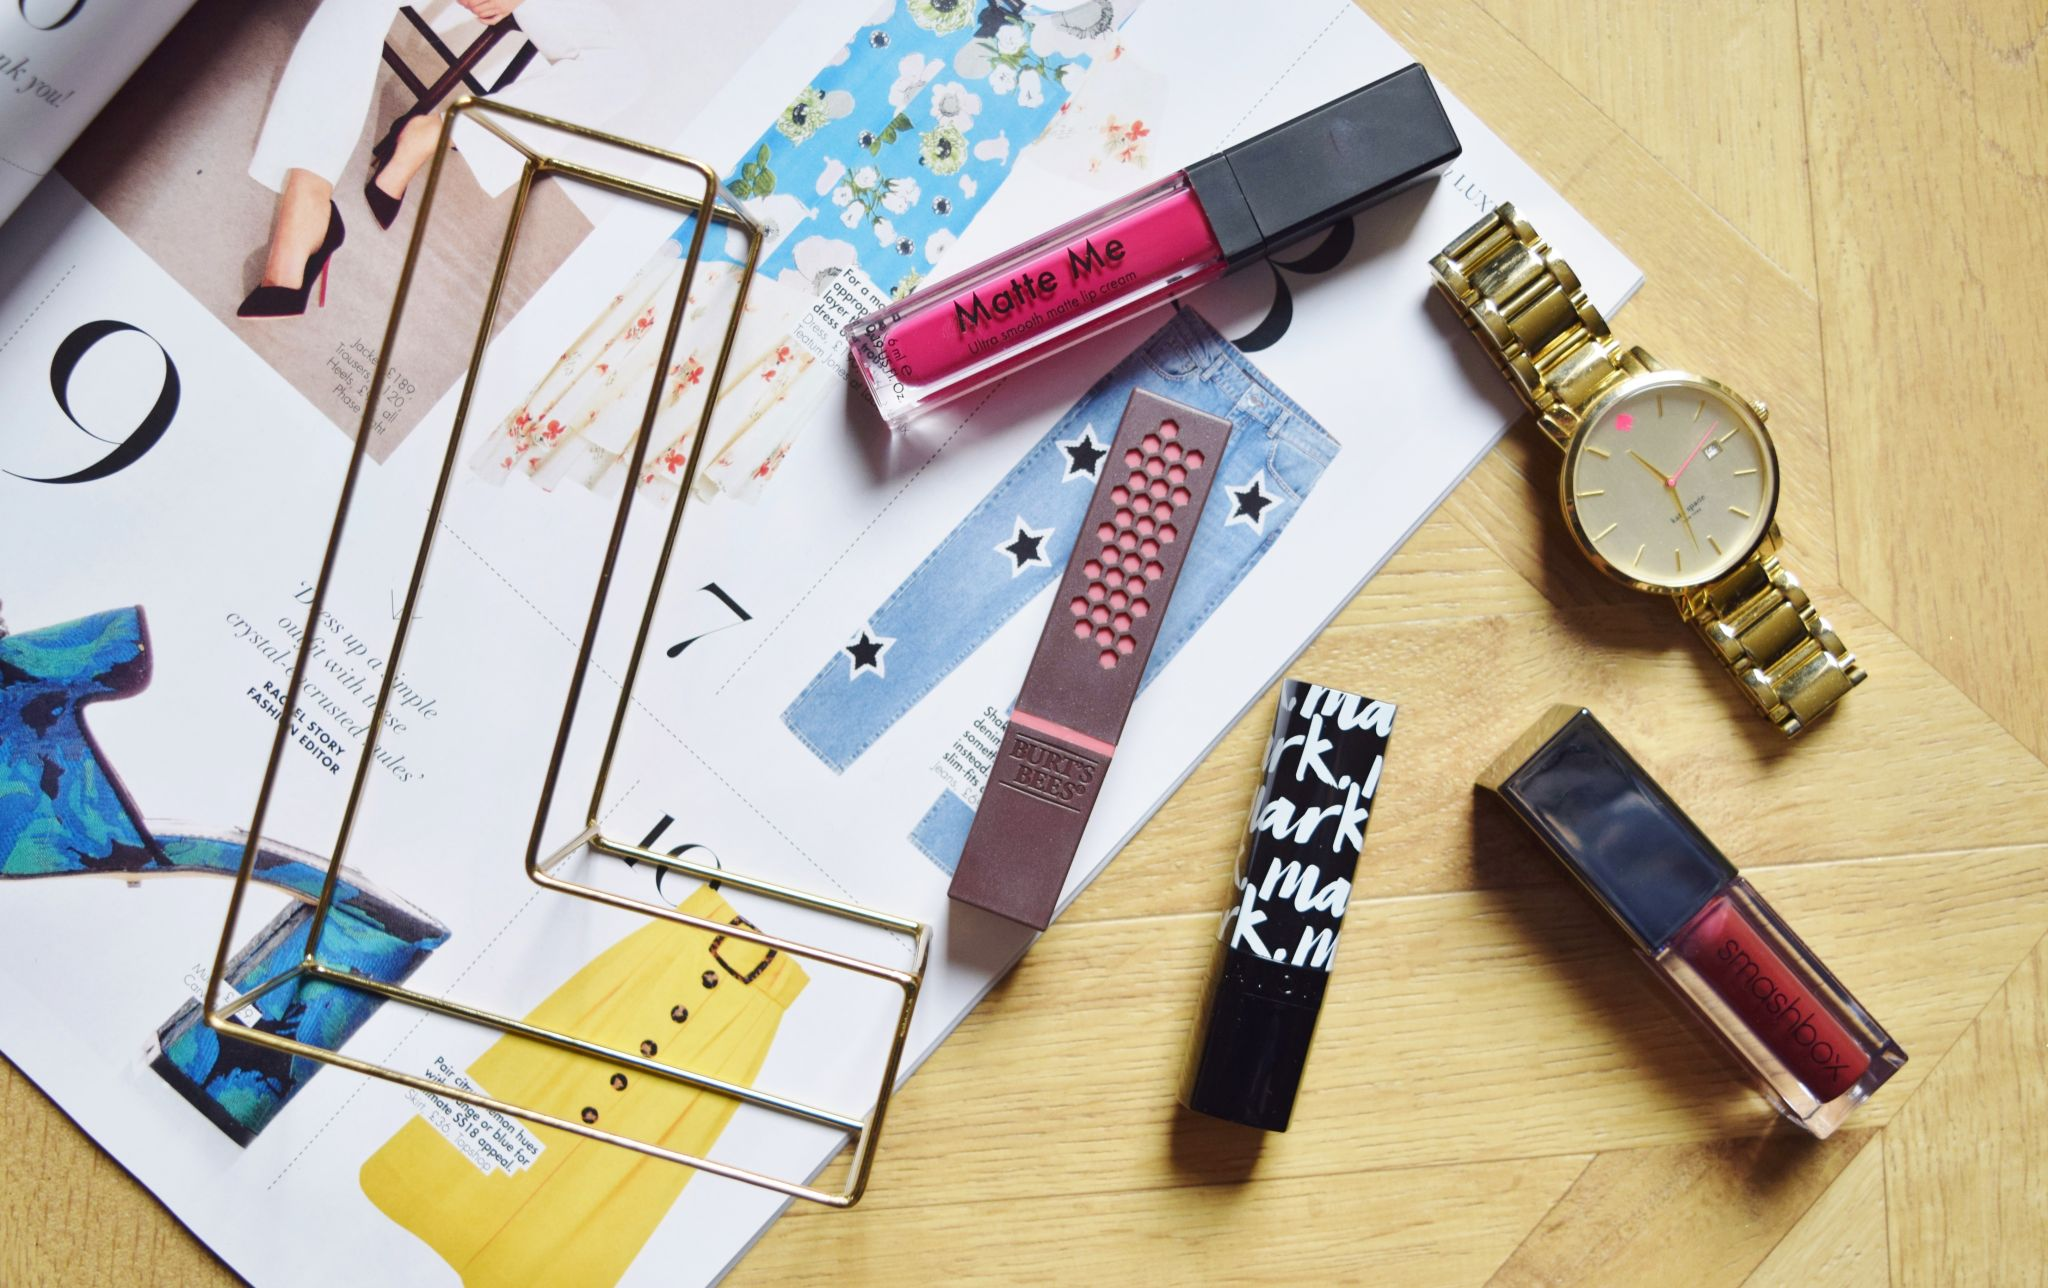 spring 2018 new lipsticks